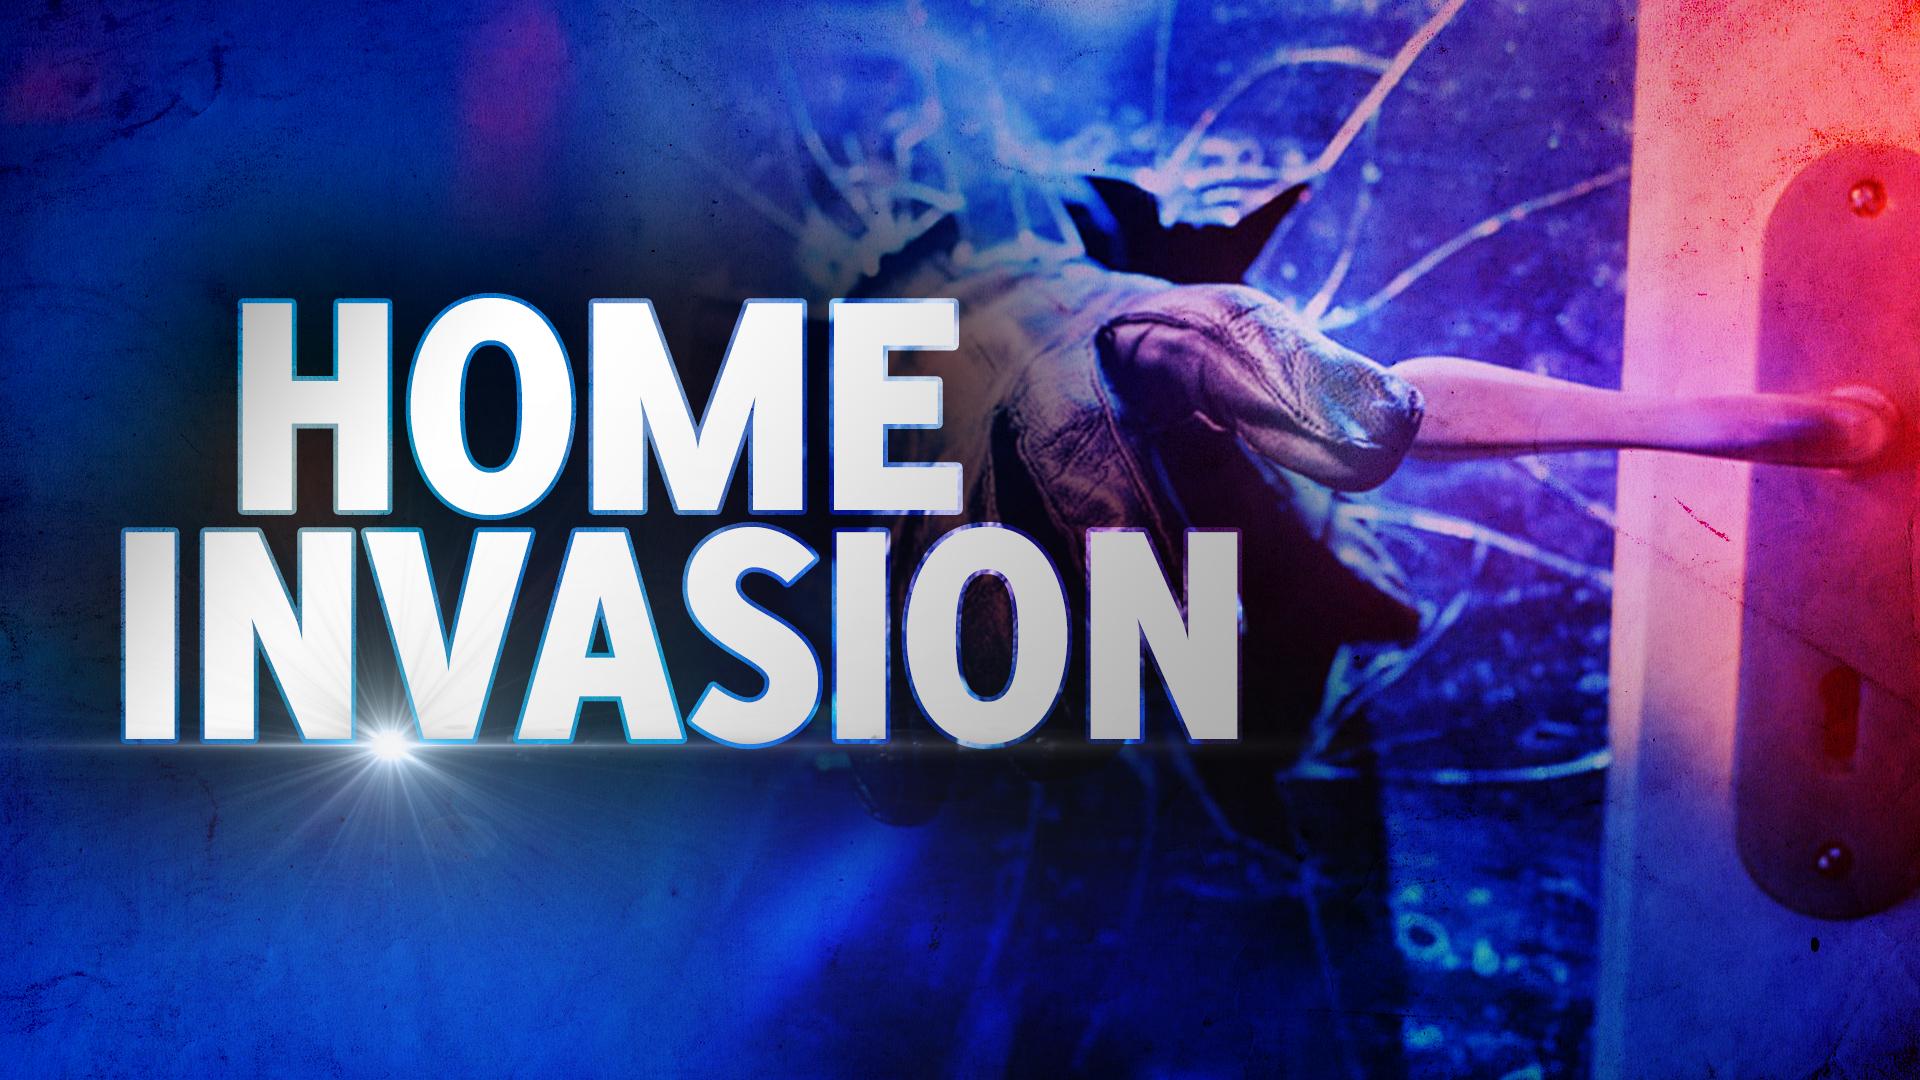 graphic FS Home Invasion 3_1523150798480.jpg.jpg